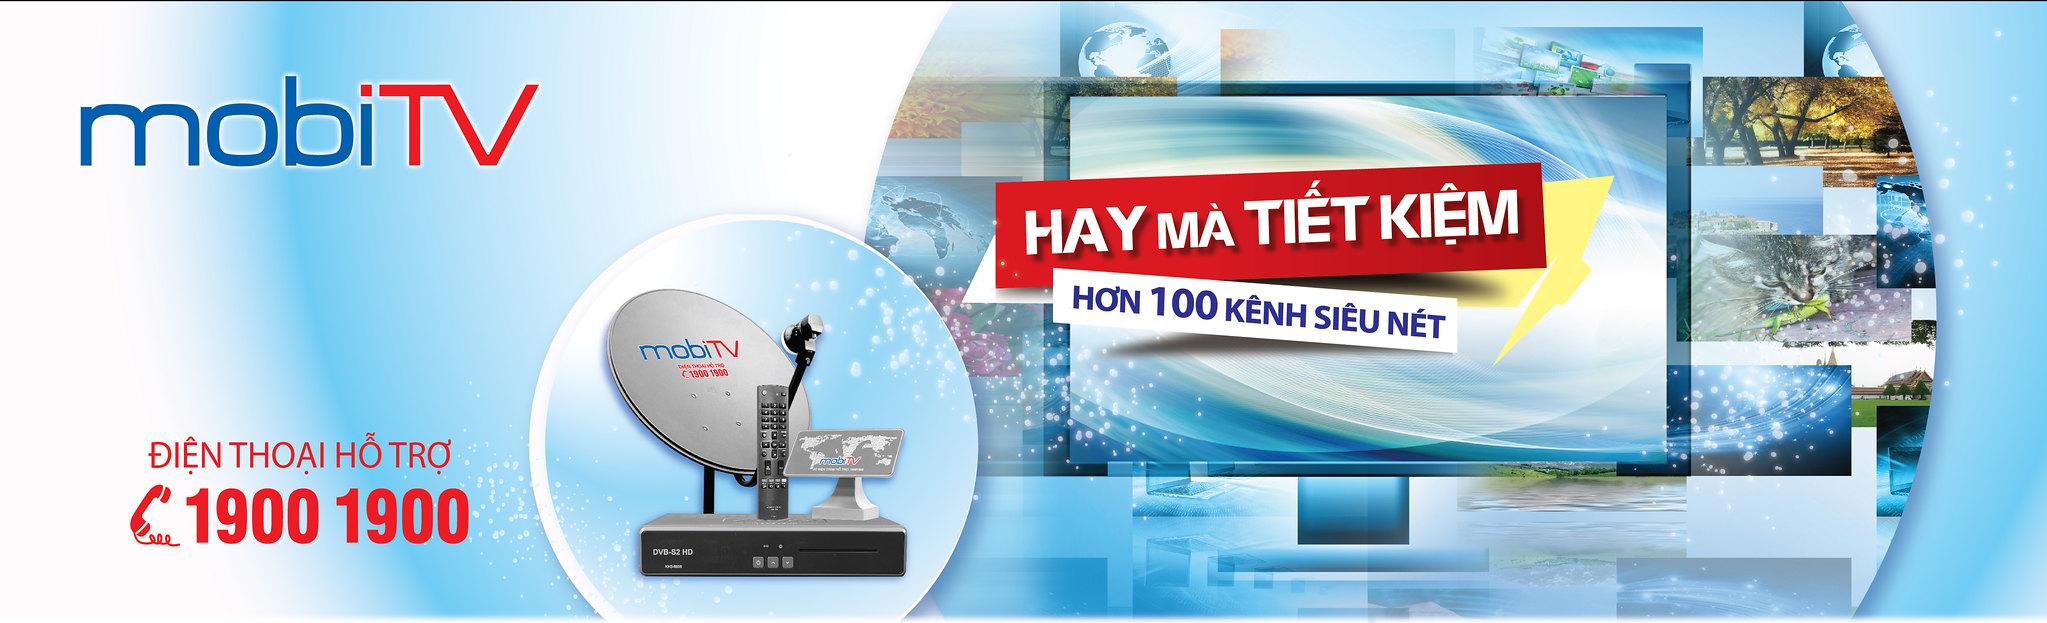 Truyen hinh MobiTV